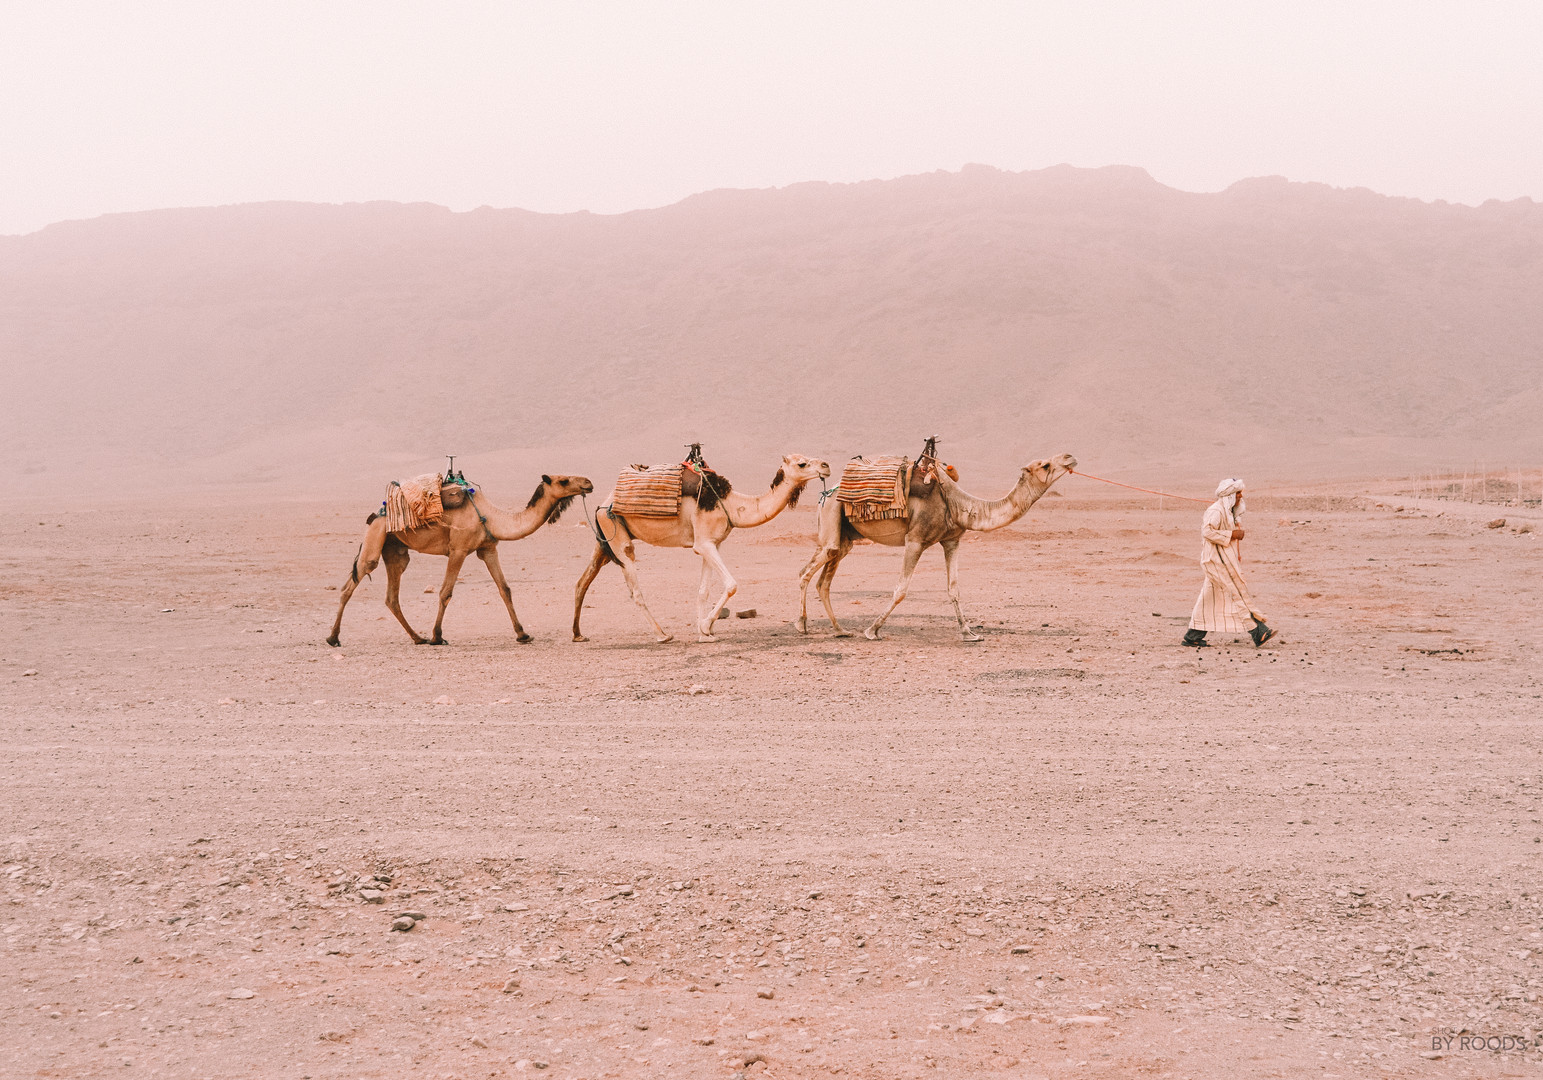 Camel trekking the Sahara, Morocco